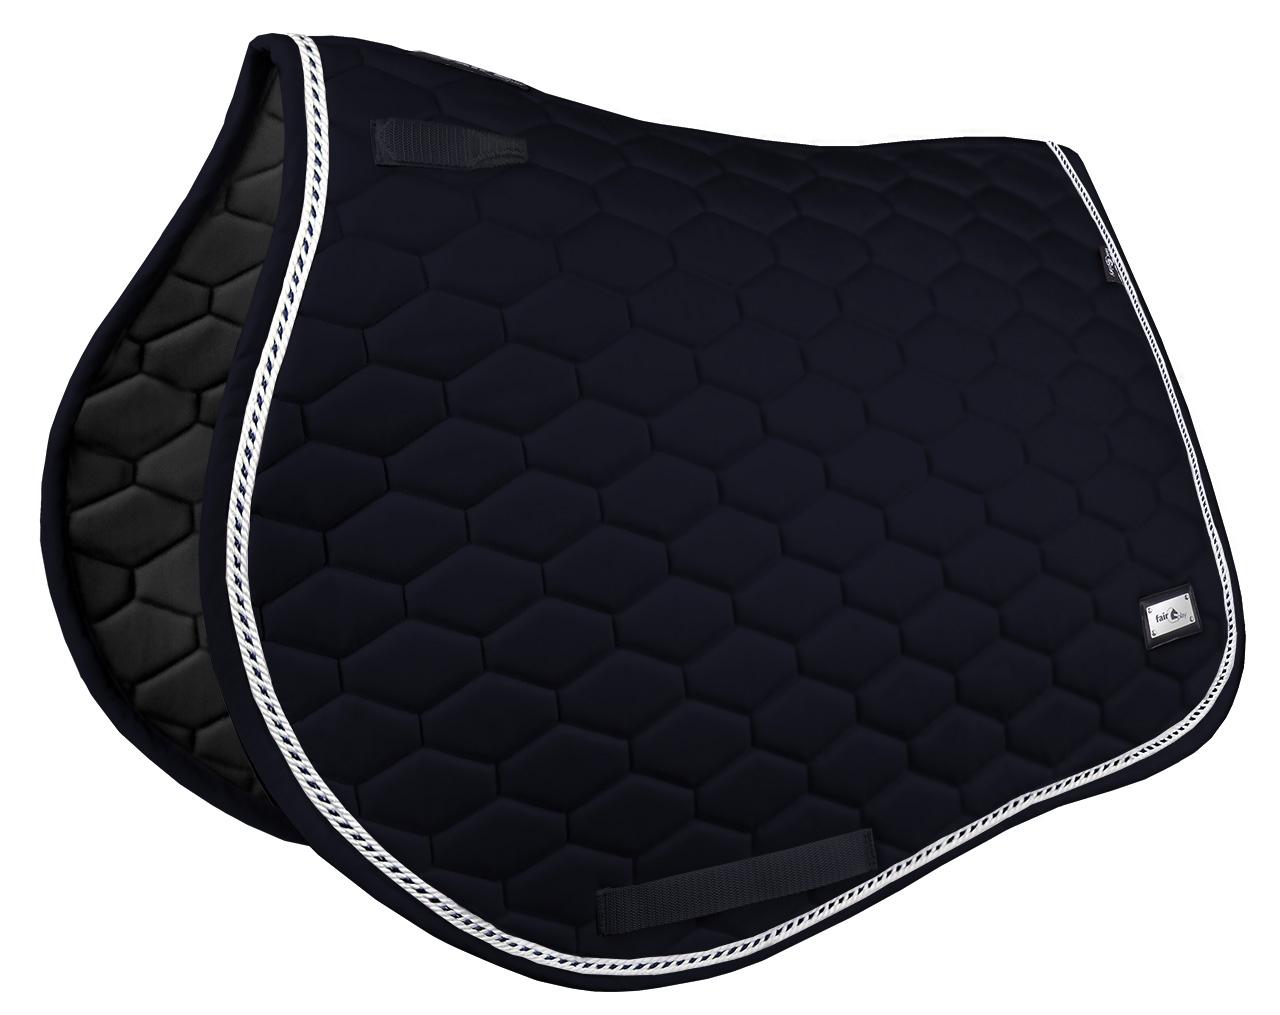 Hexagon Saddle pad VSS svart